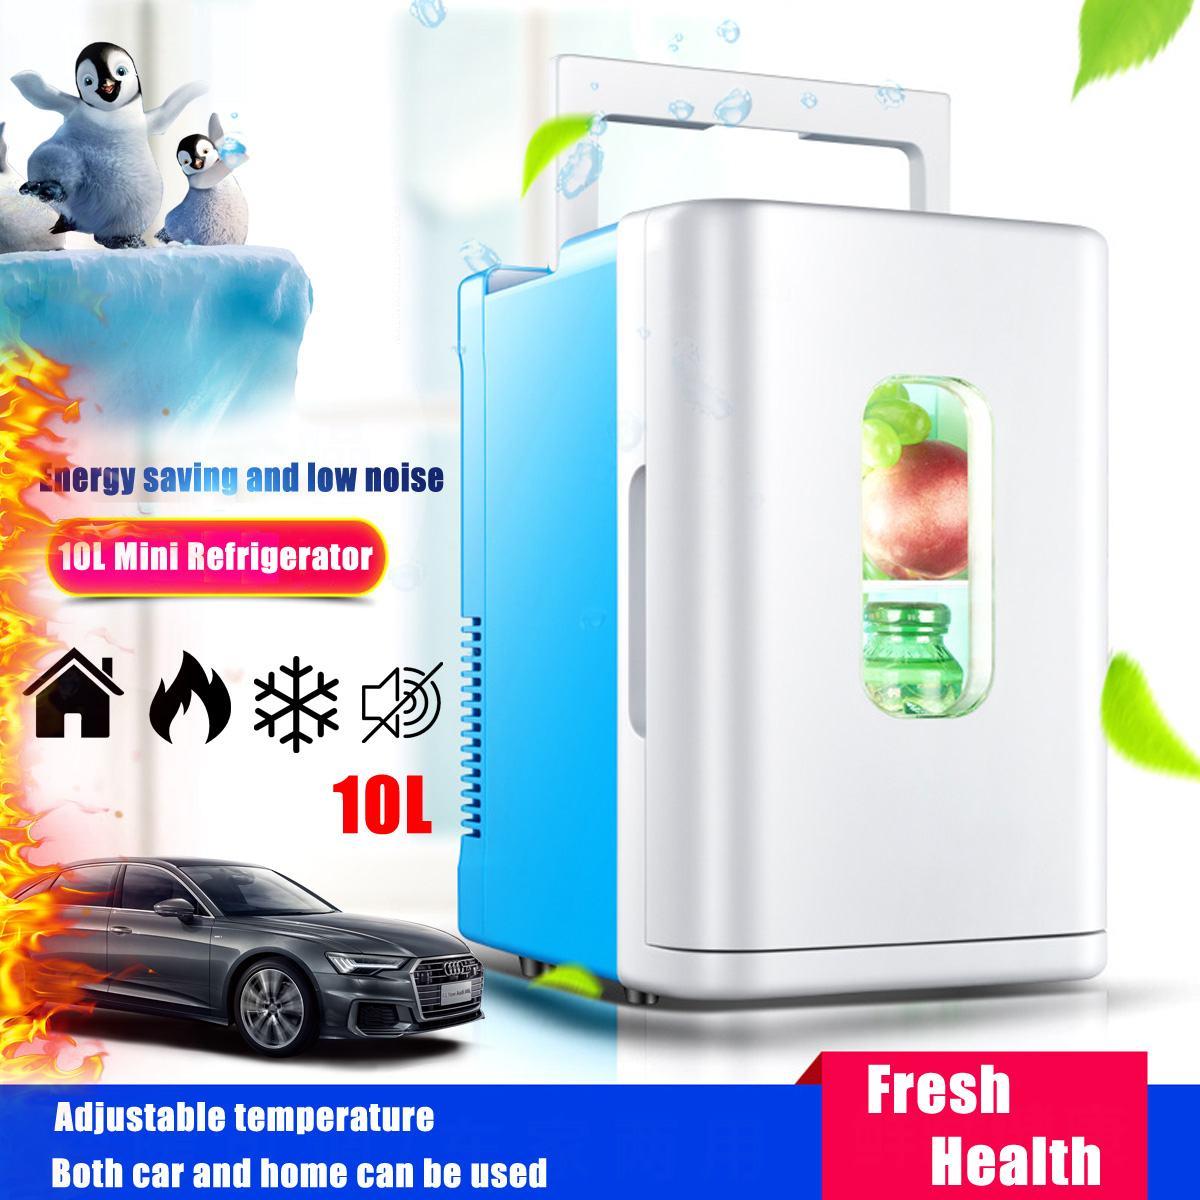 AUGIENB 220V Electric Refrigerator 10L Dormitory Small Refrigerator Multi-Purpose Refrigerator Home Dual-Use